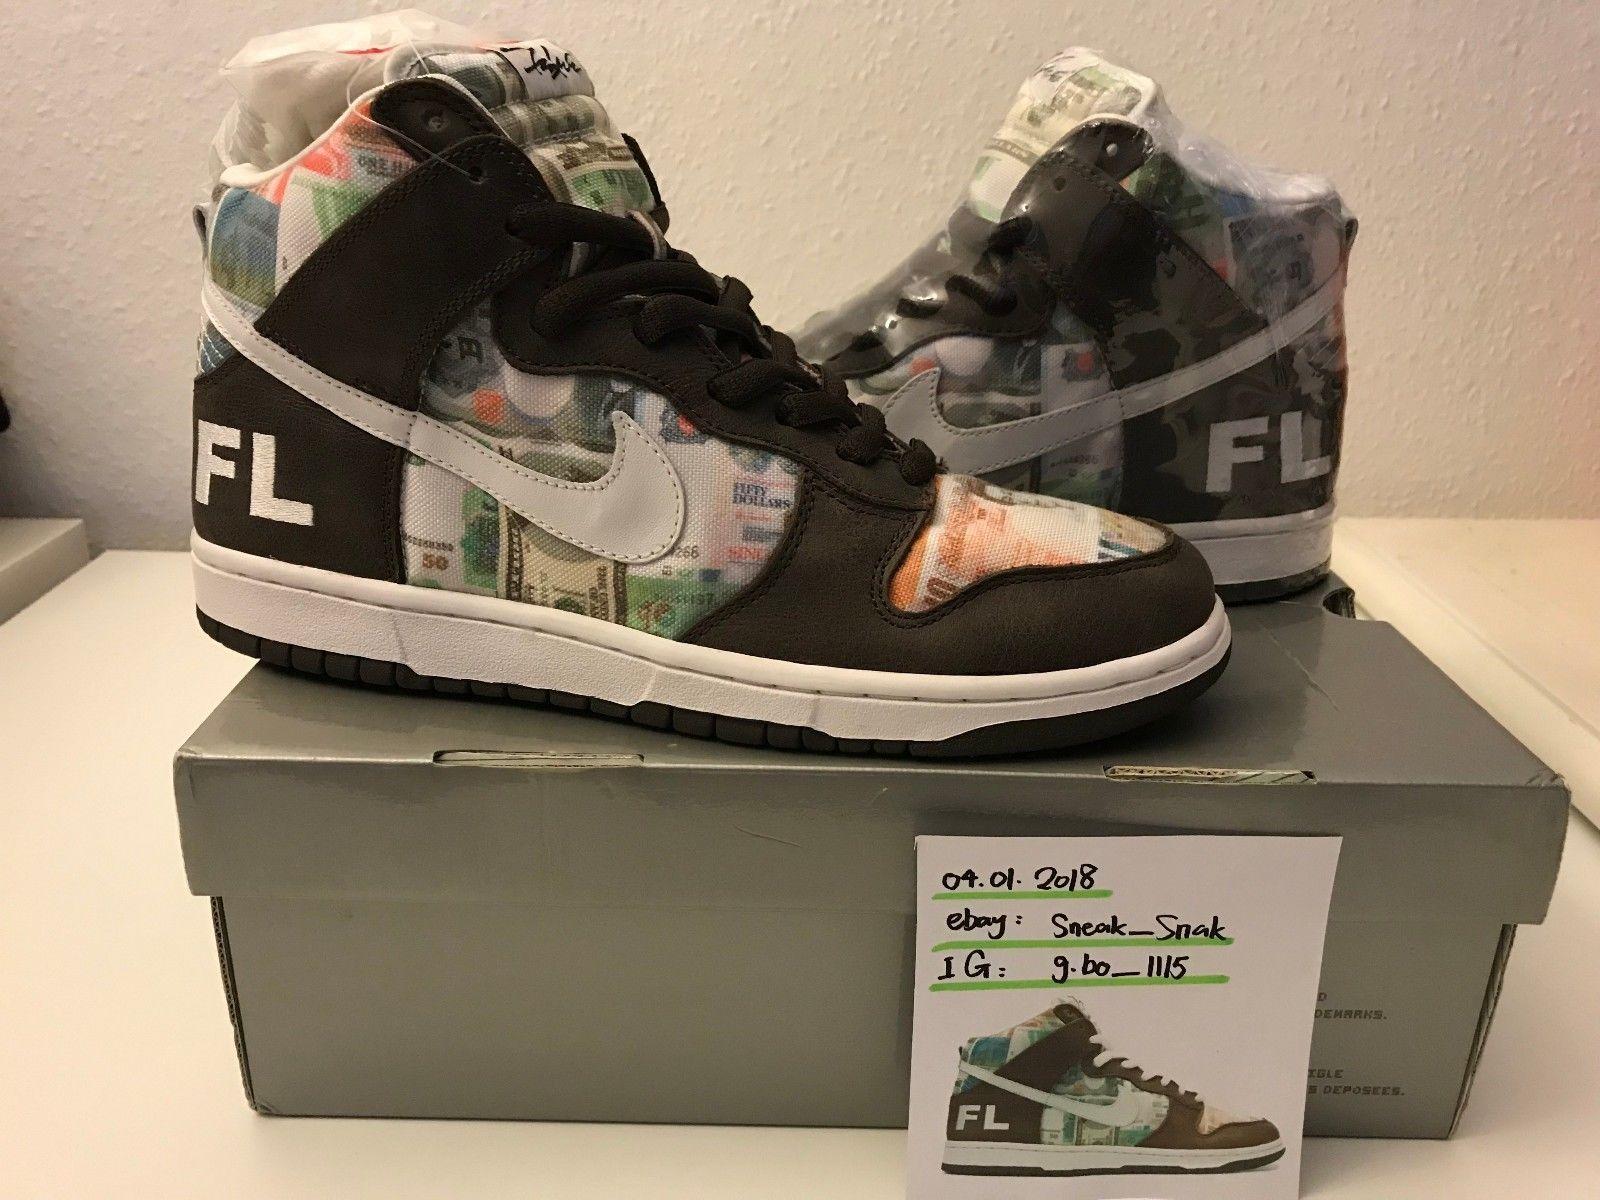 timeless design 7791e 2210e Nike Dunk High Pro SB For Love Or Money FLOM paris london pigeon tokyo ft  sample